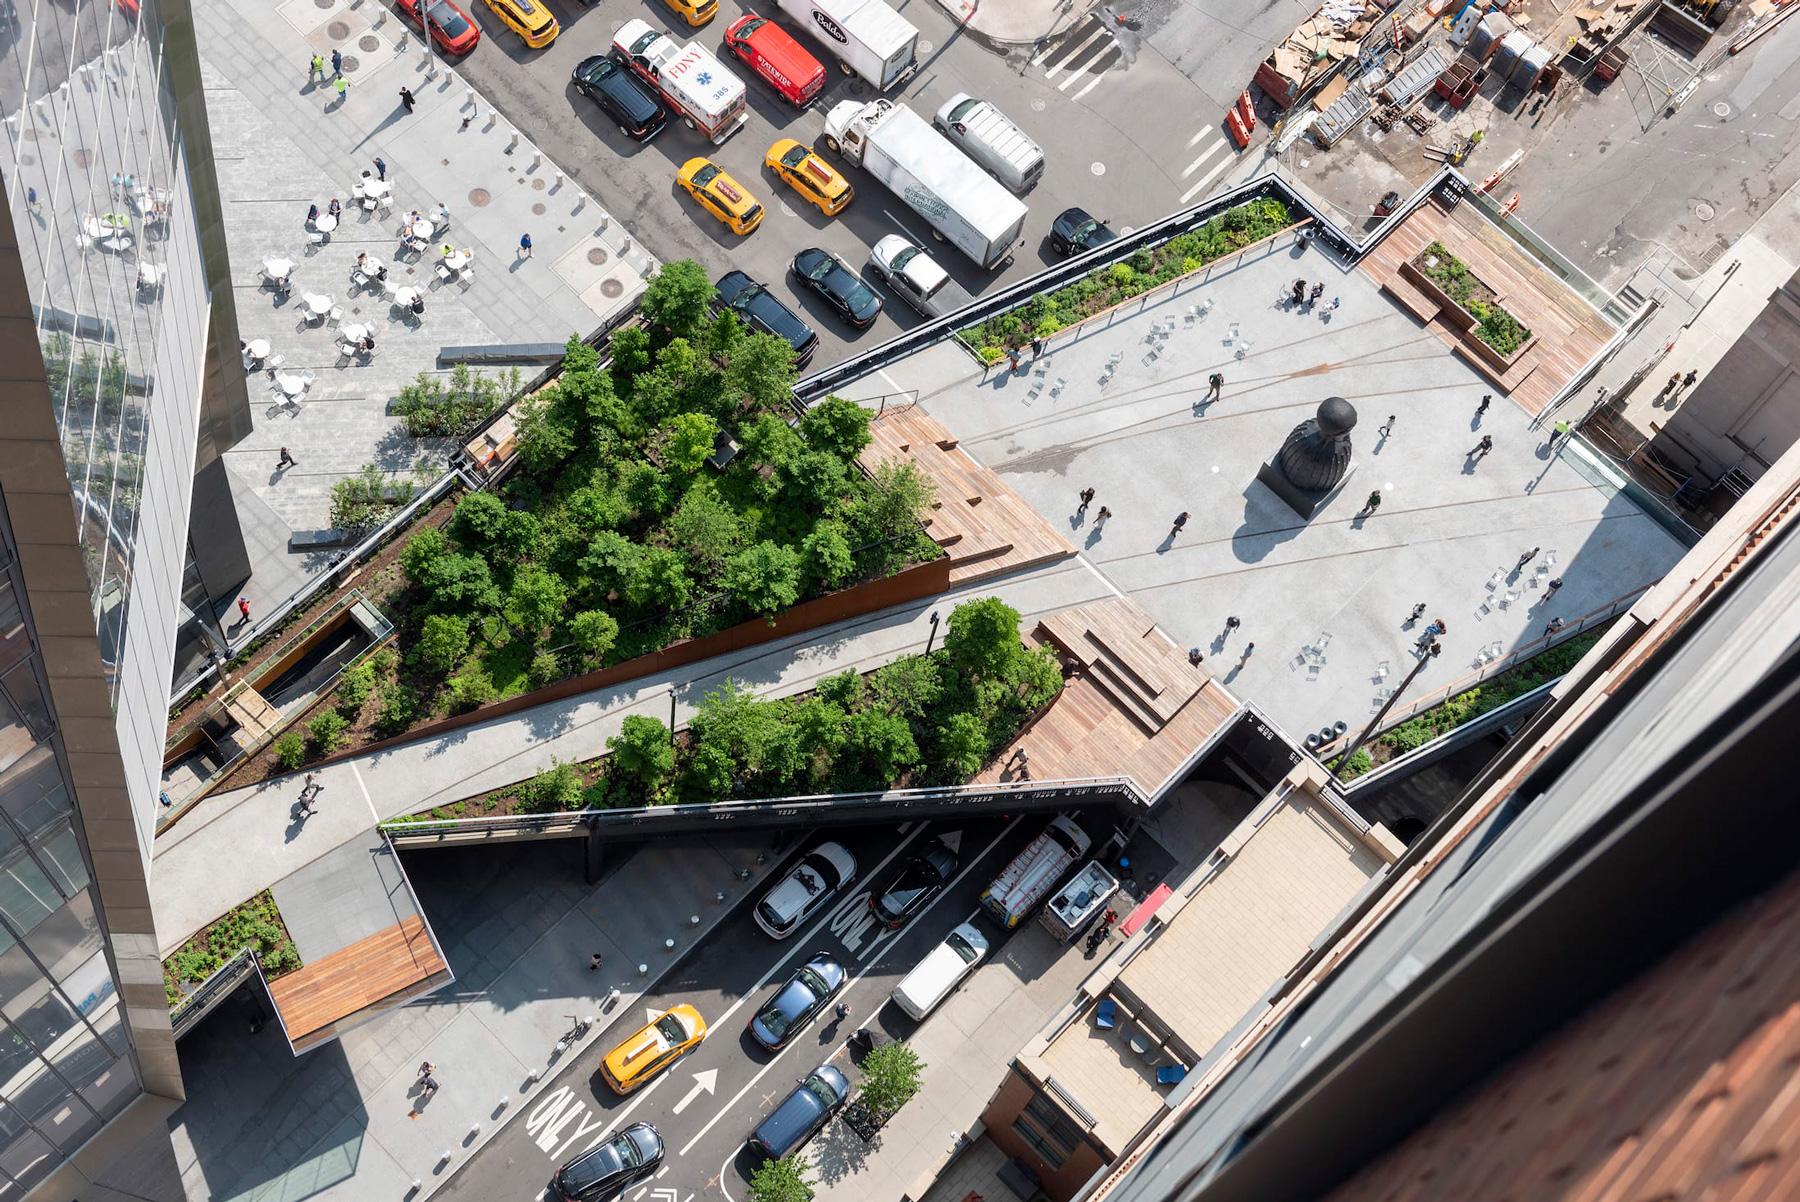 High-Line-New-York-Estudio-Diller,-Scofidio-+-Renfro-paisajista-Piet-Oudolf-Lifestyle-Porcelanosa-1-comprimida-2